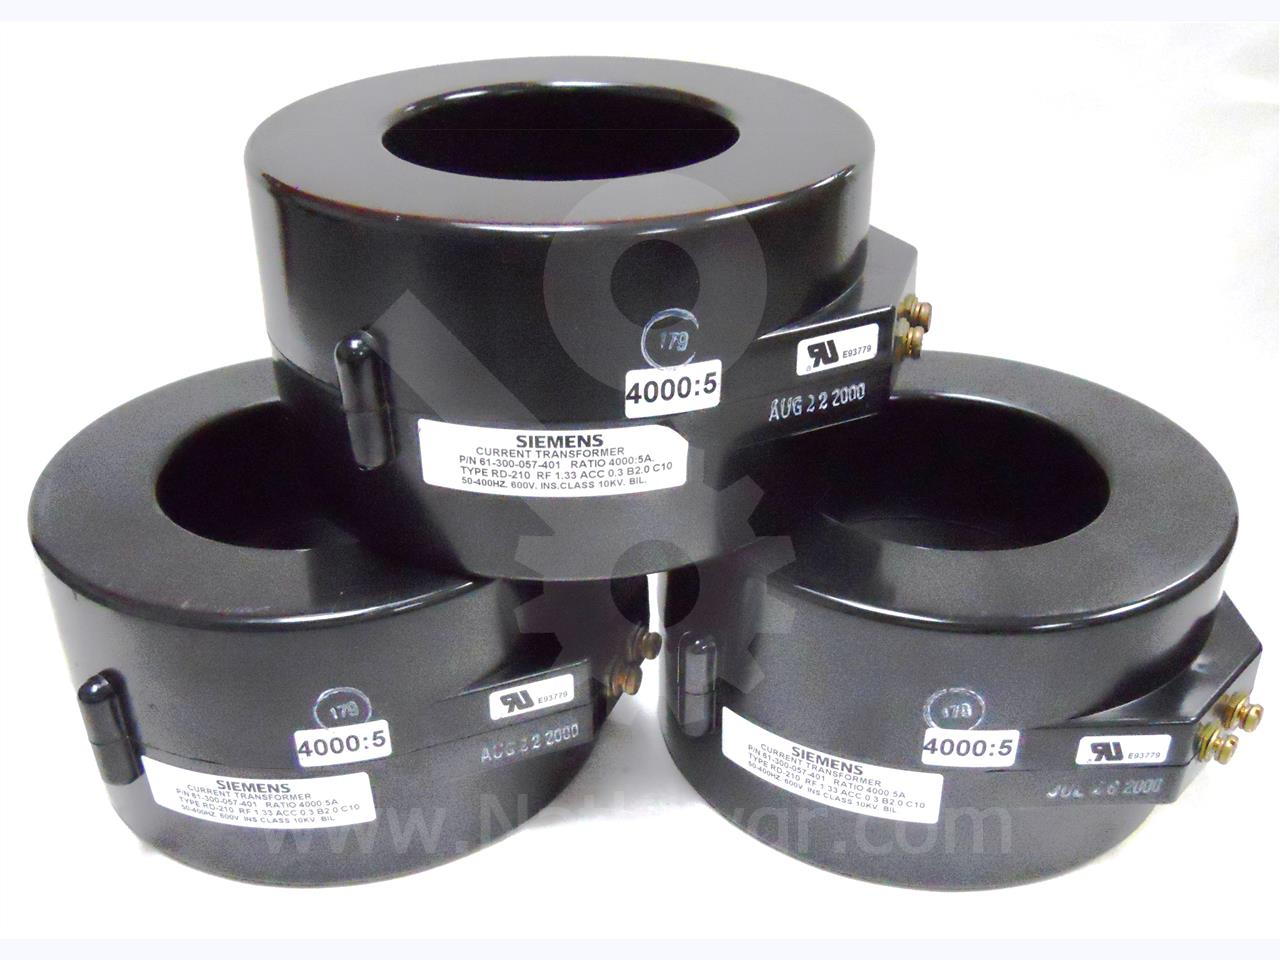 61-300-057-401 Siemens / Allis Chalmers CURRENT TRANSFORMER, 4000:5 RD-210, C10